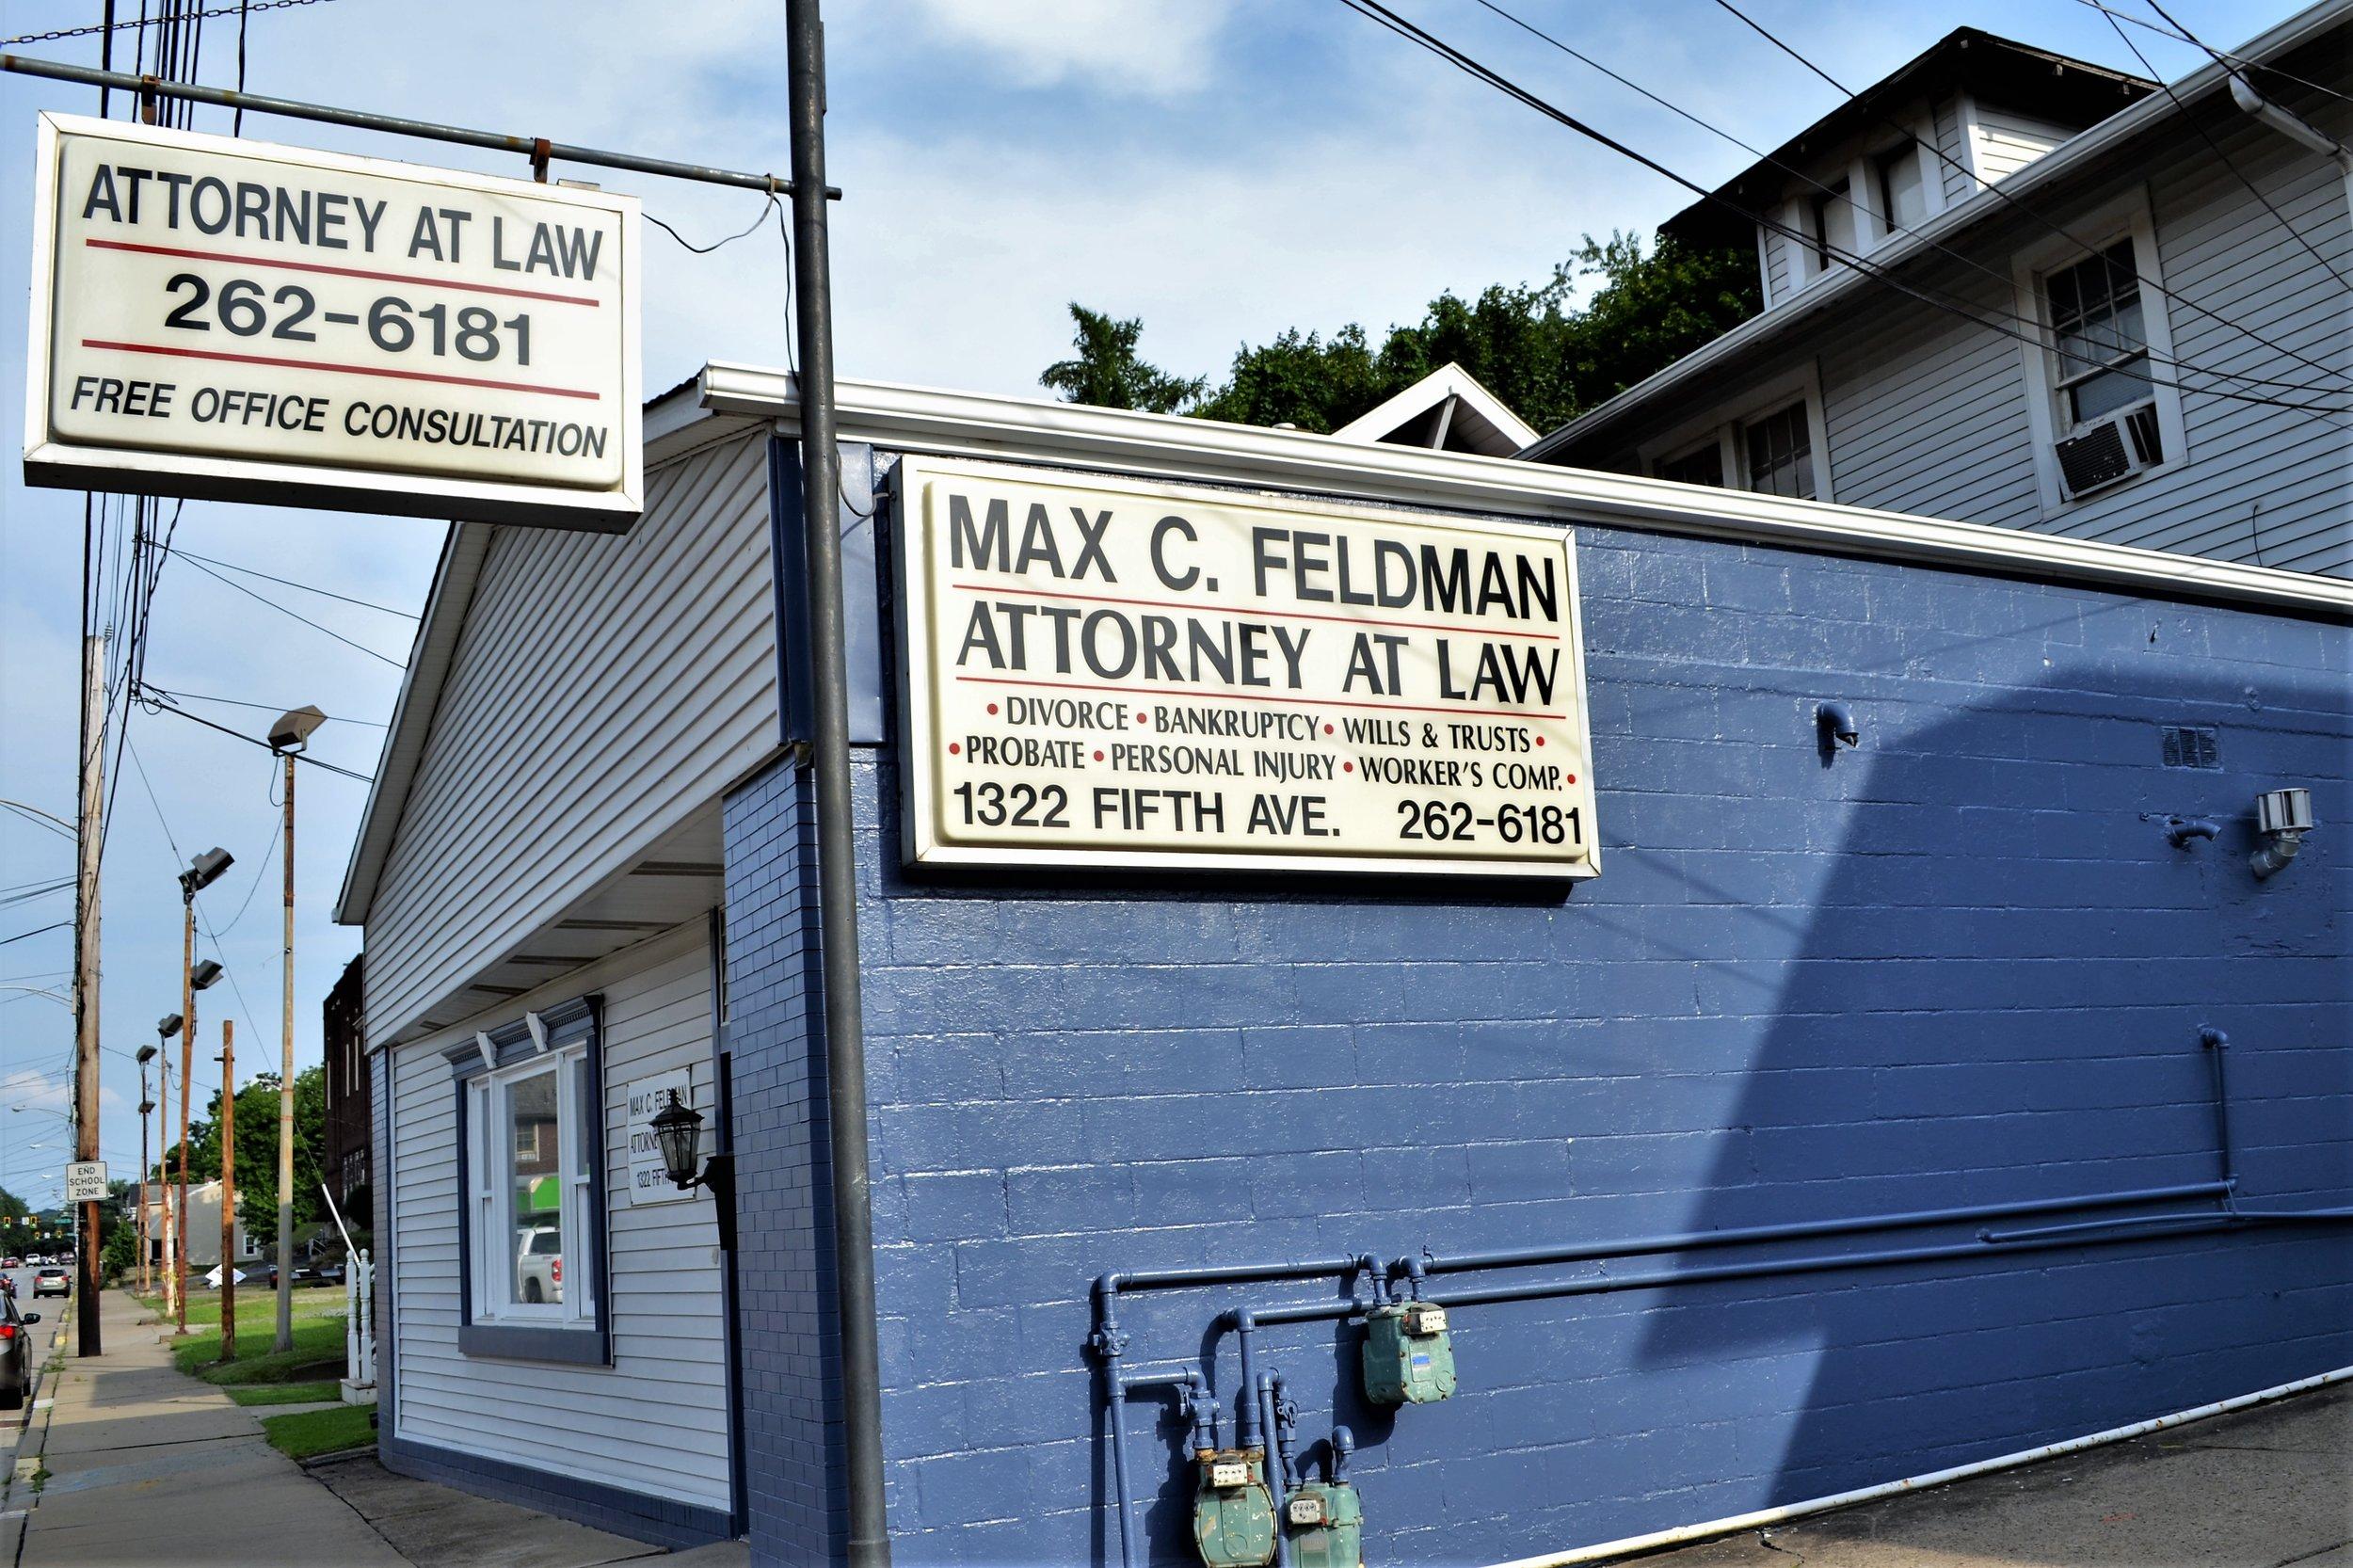 Max C. Feldman, Attorney at Law - 1322 5th Ave, (412) 262-6181